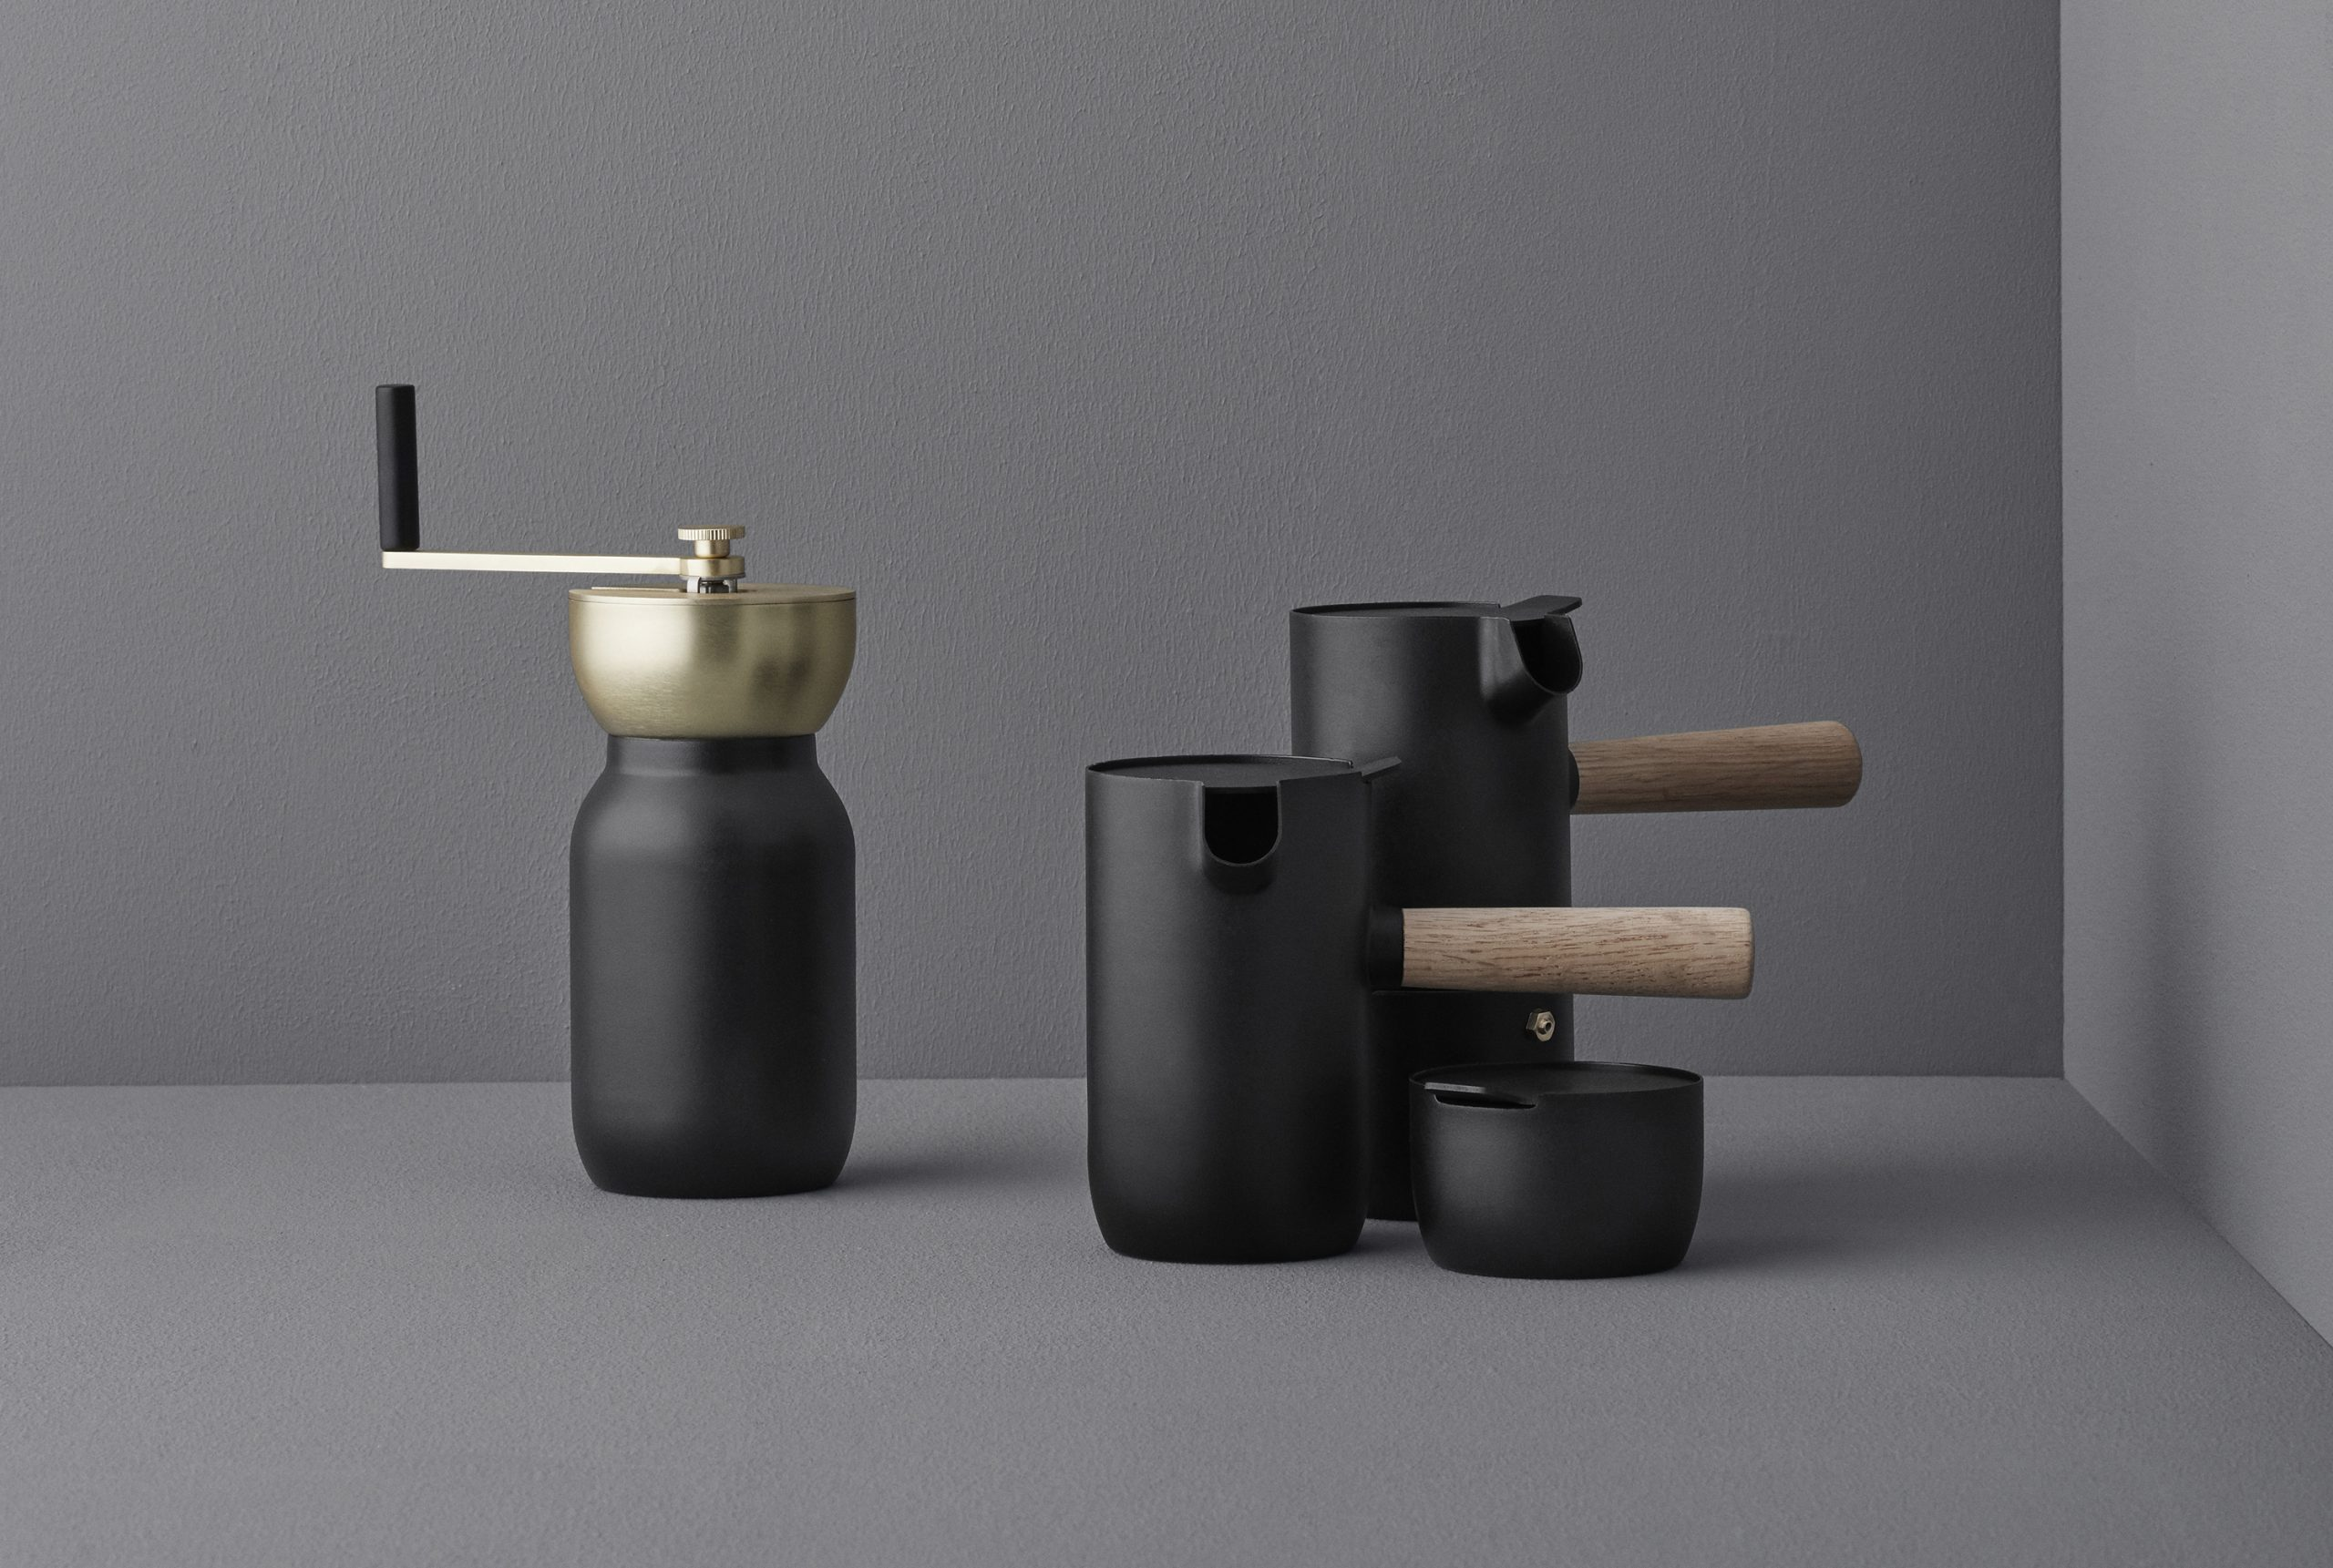 Collar coffee set by Debiasi Sandri for Stelton